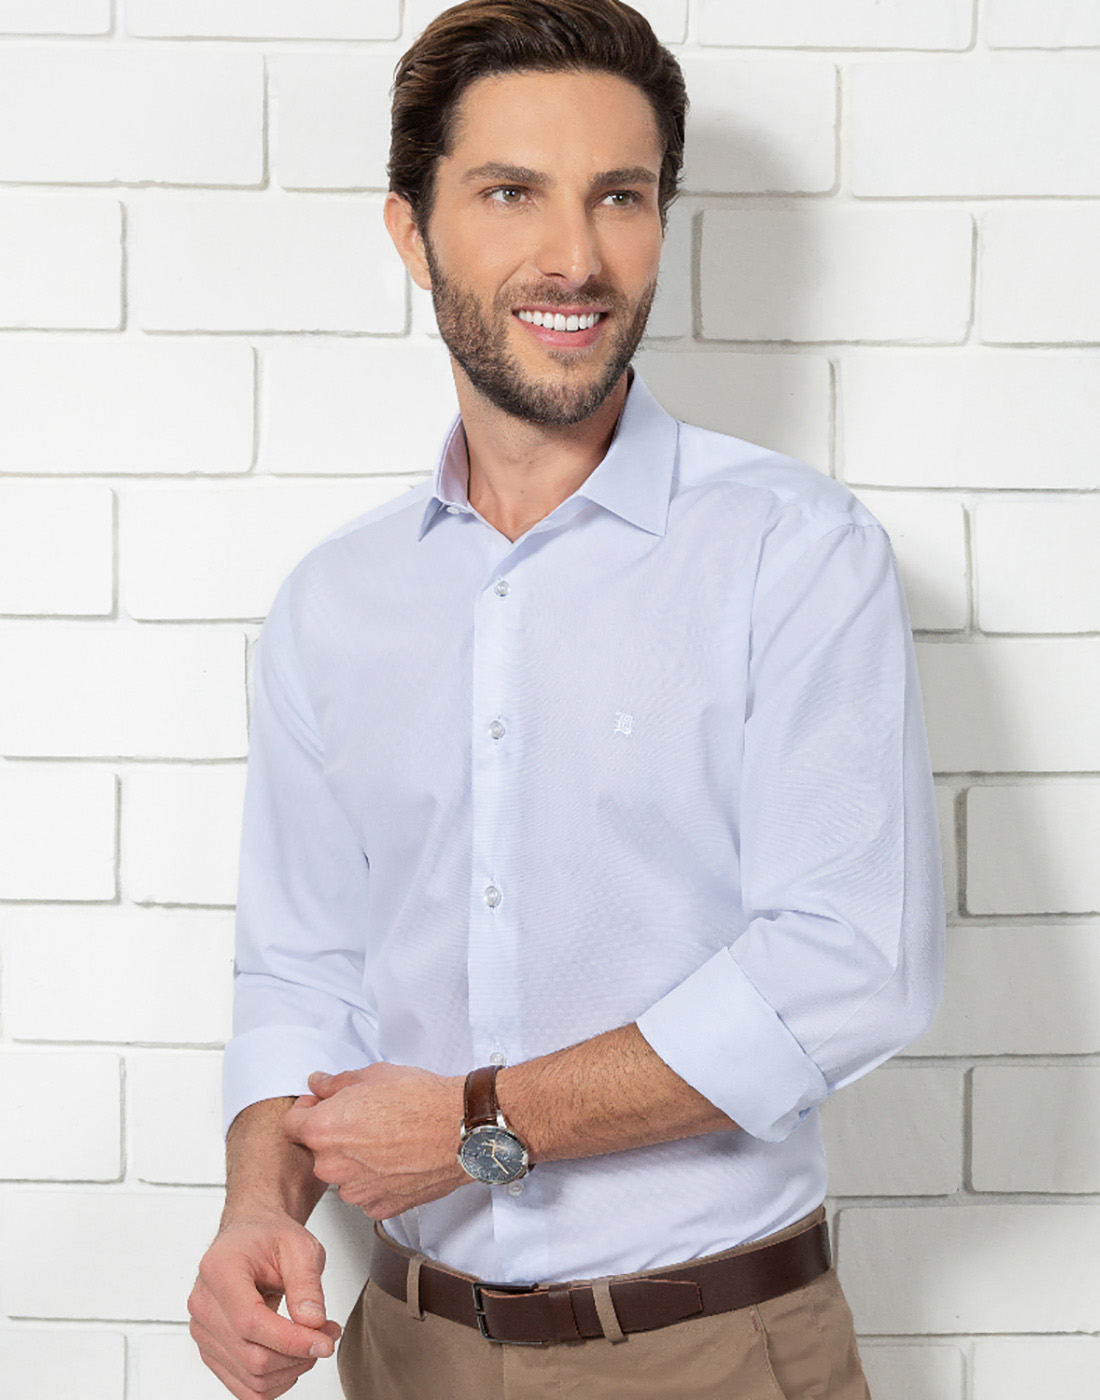 Camisa Manga Longa Estampada Branco Baumgarten Elegance